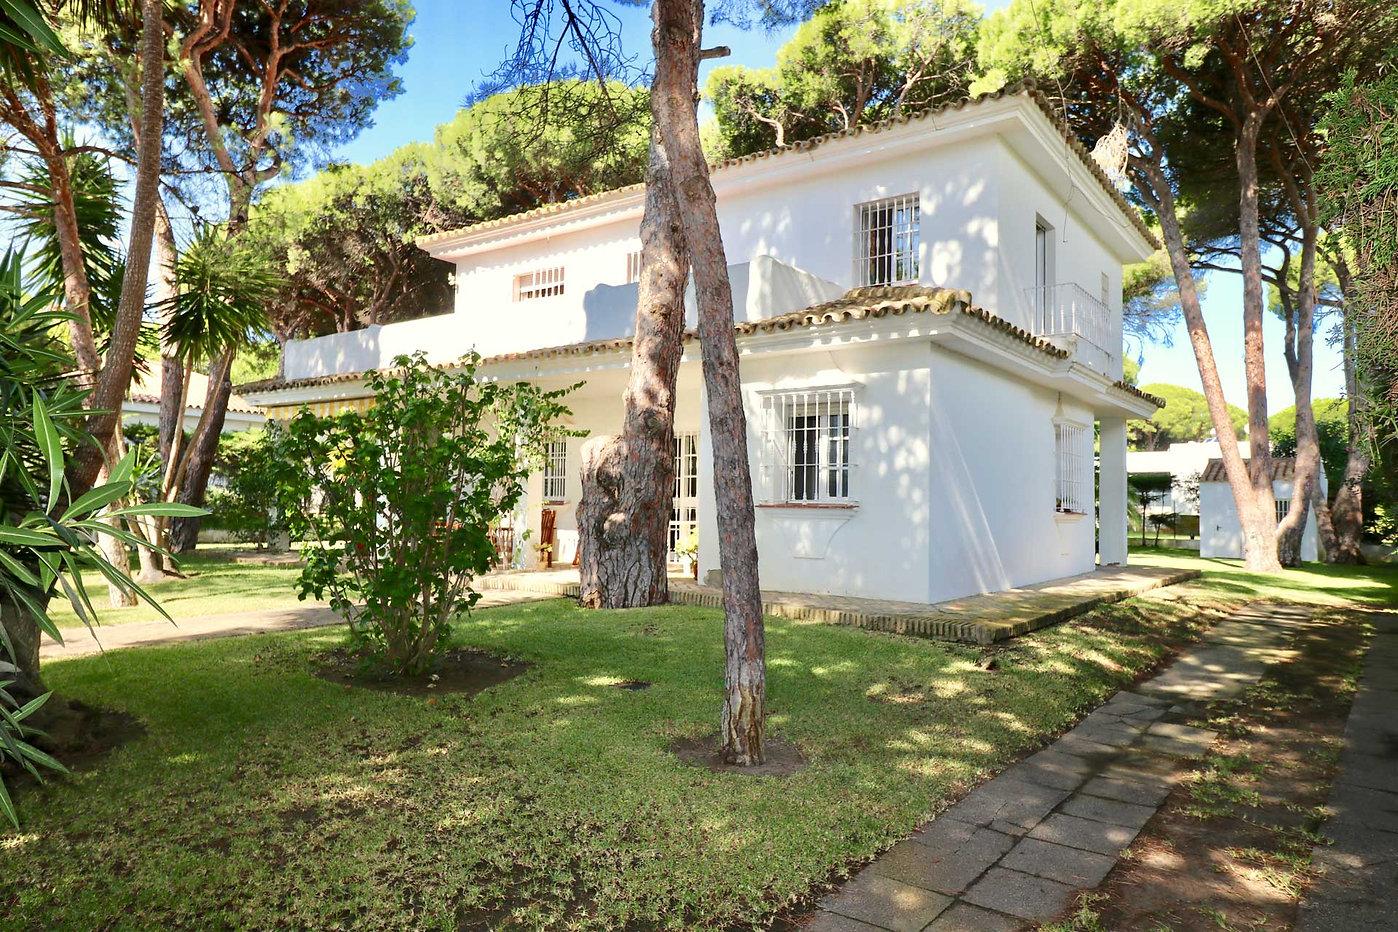 garden-pine-trees-house-roche-refv69.jpg